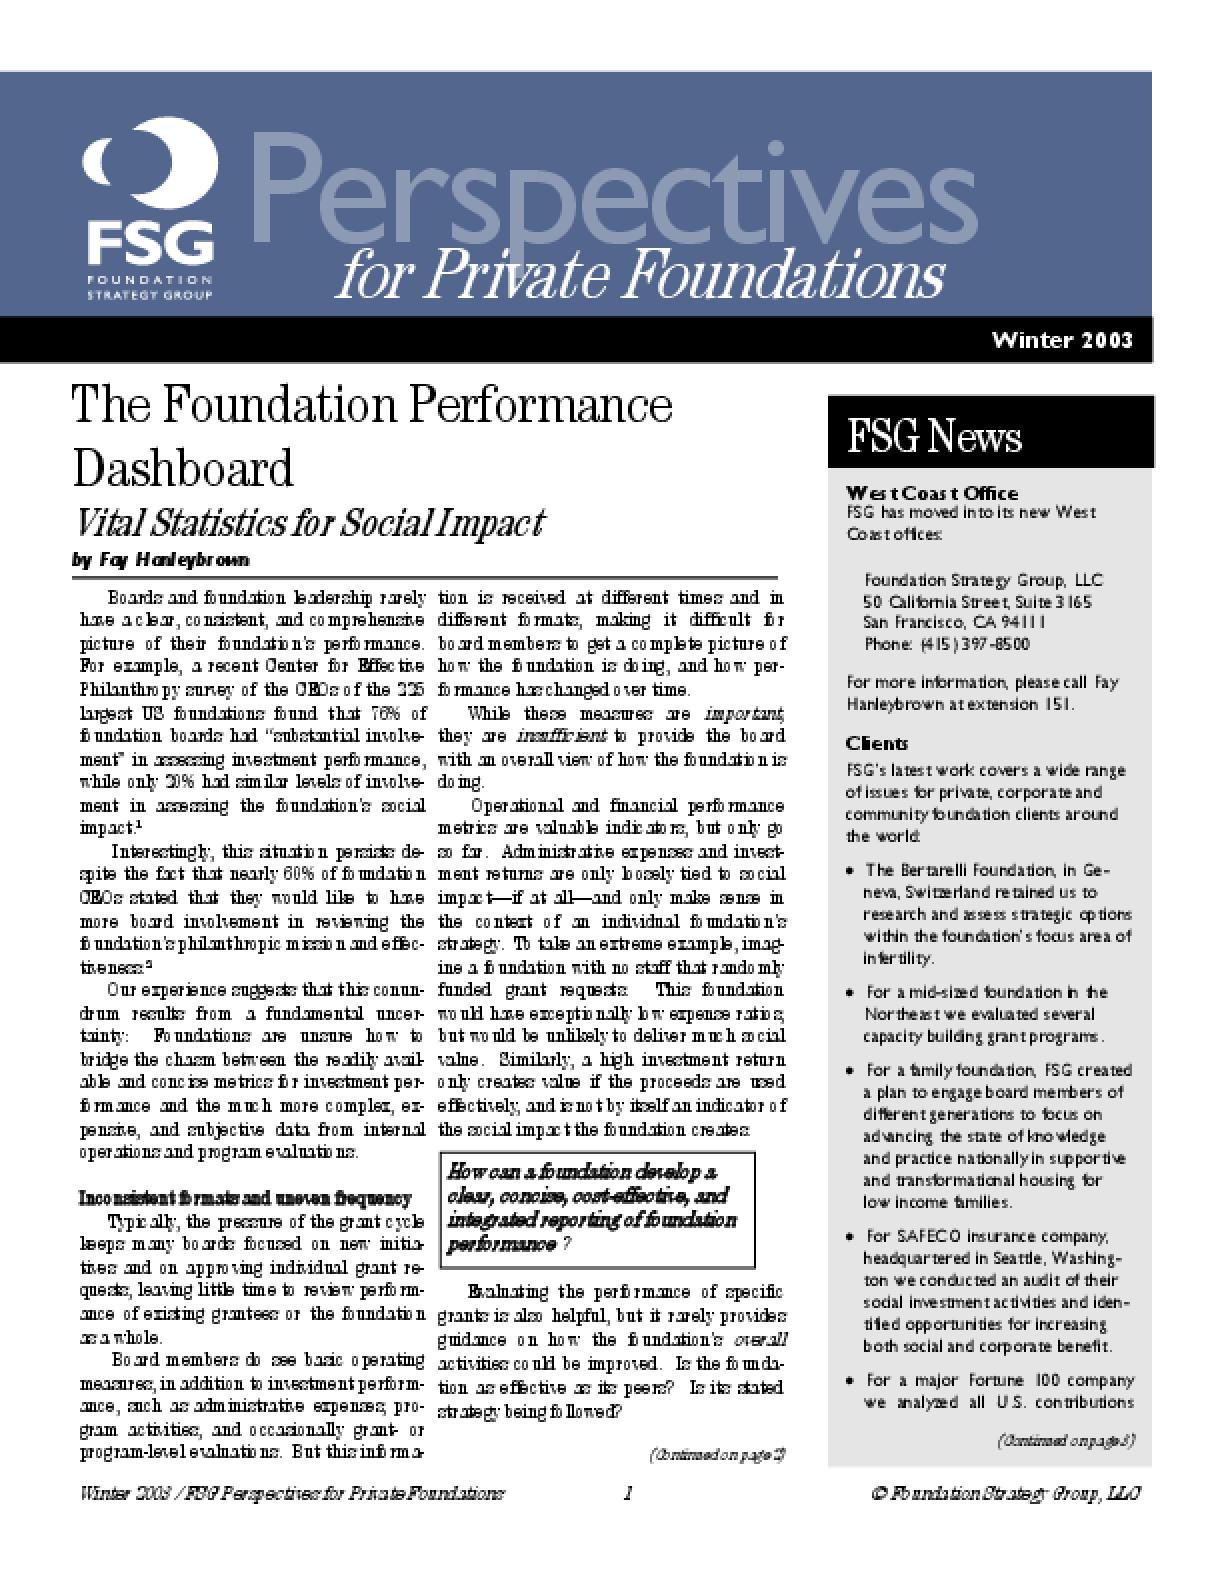 The Foundation Performance Dashboard: Vital Statistics for Social Impact